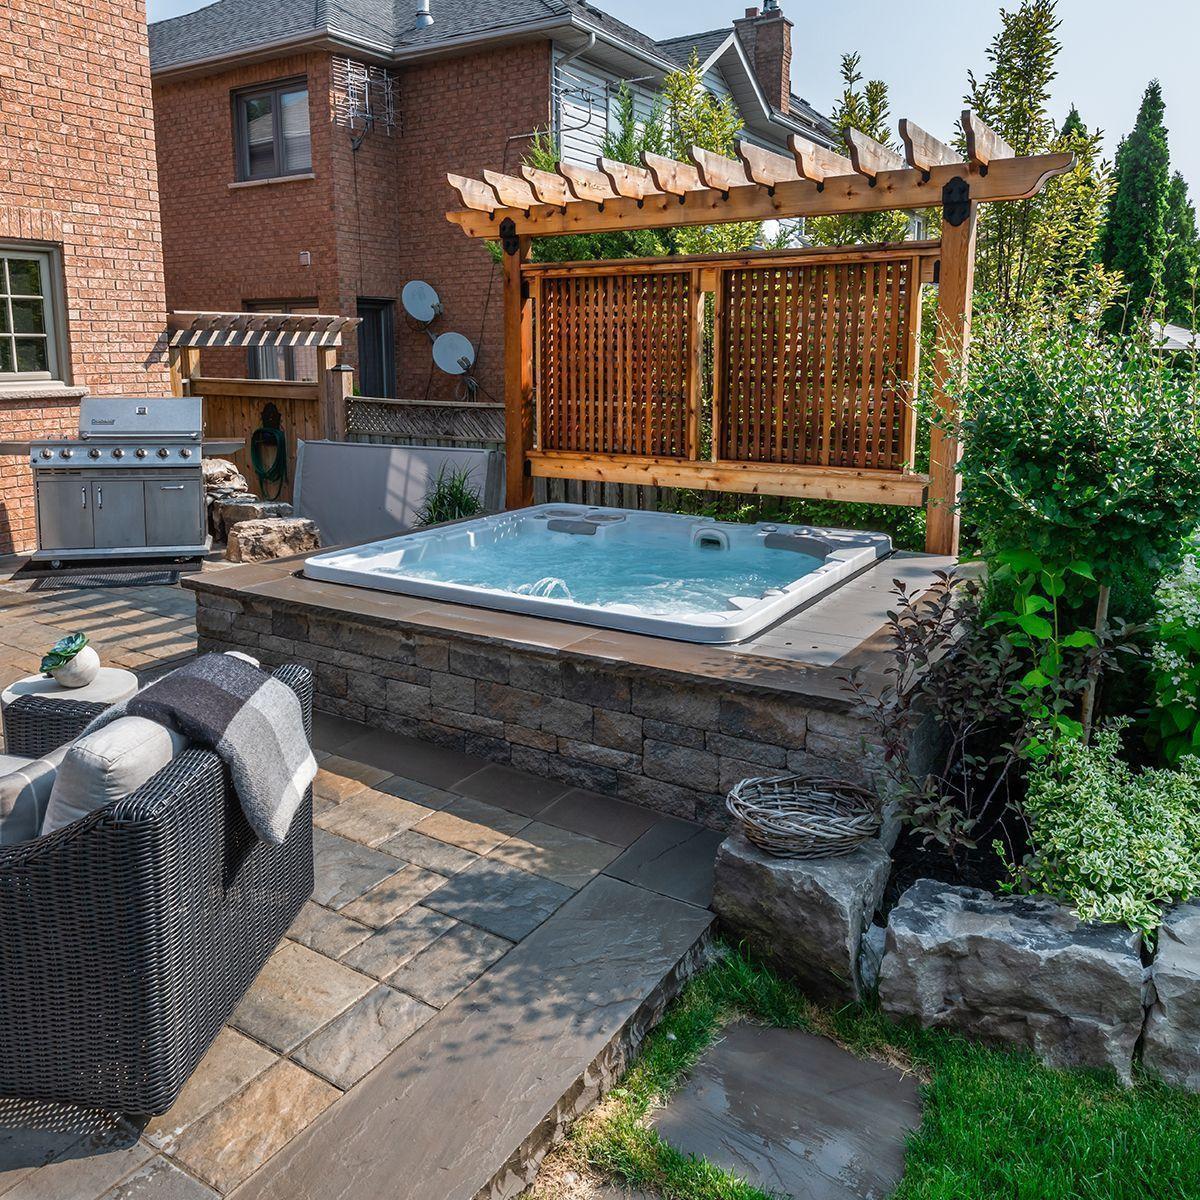 Pin On Patio Ideas Hot Tub Patio Hot Tub Outdoor Hot Tub Backyard Modern patio with hot tub